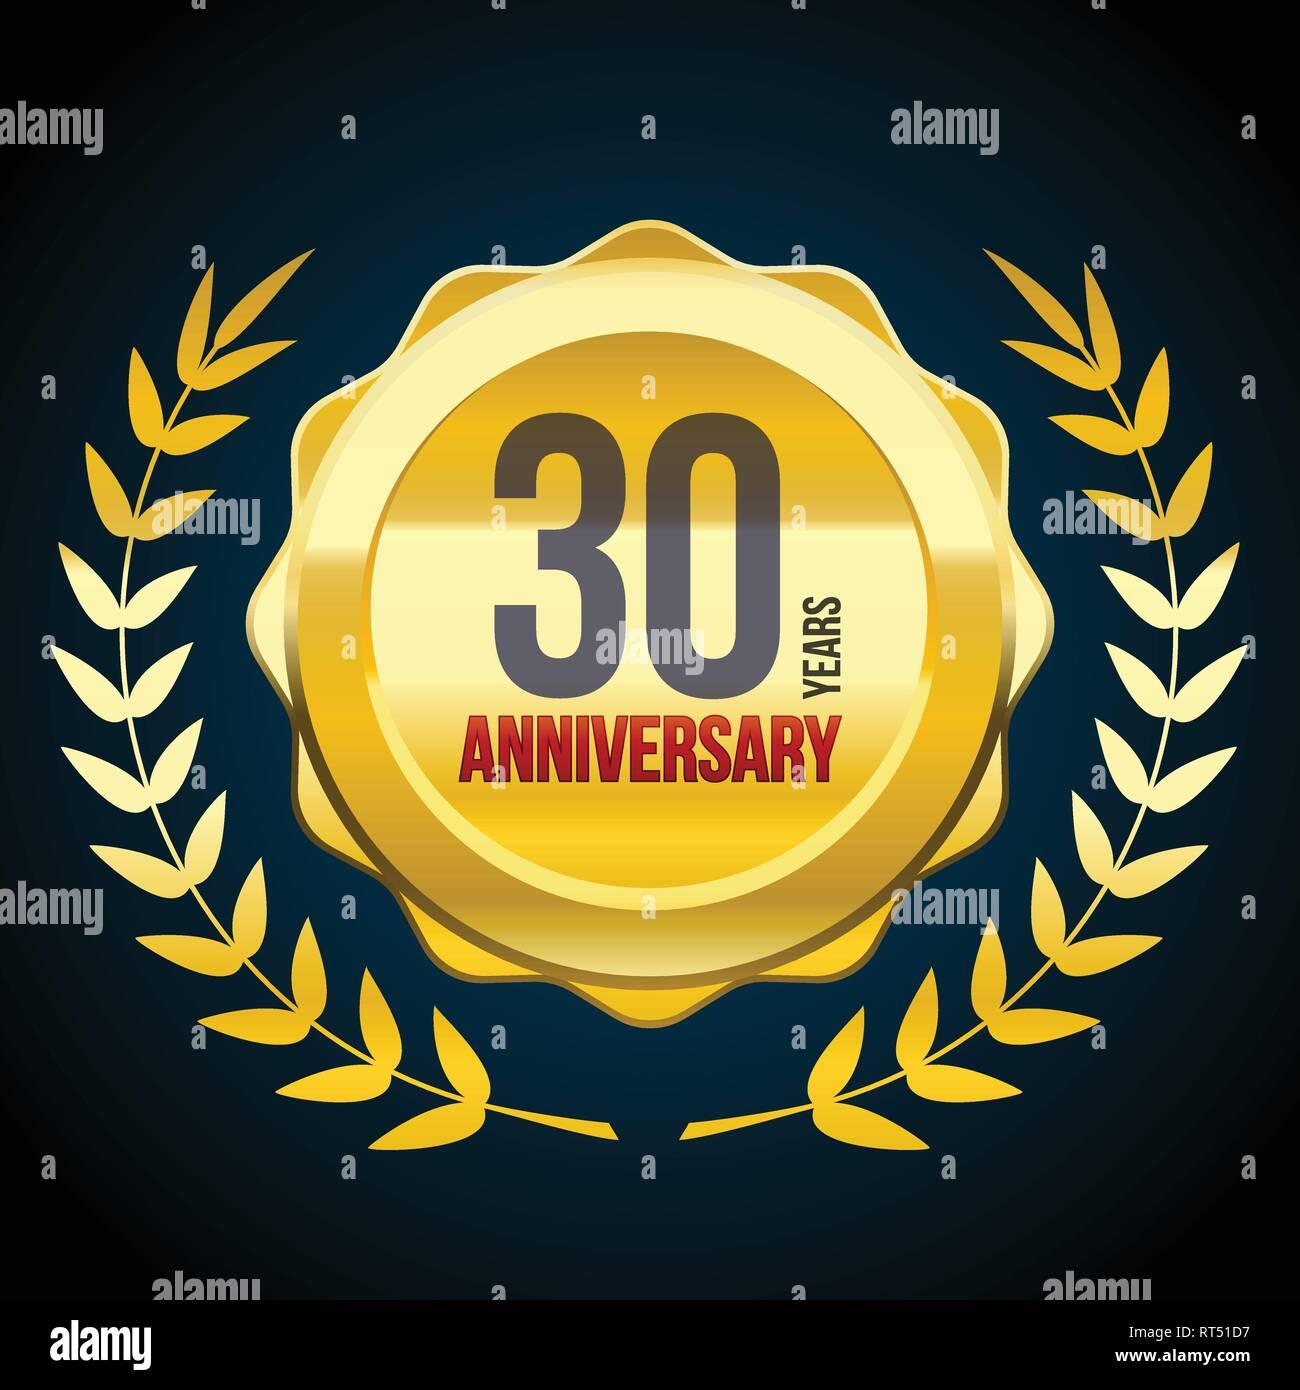 Trentesimo Anniversario Di Matrimonio.30 Anniversario Di Matrimonio Immagini 30 Anniversario Di